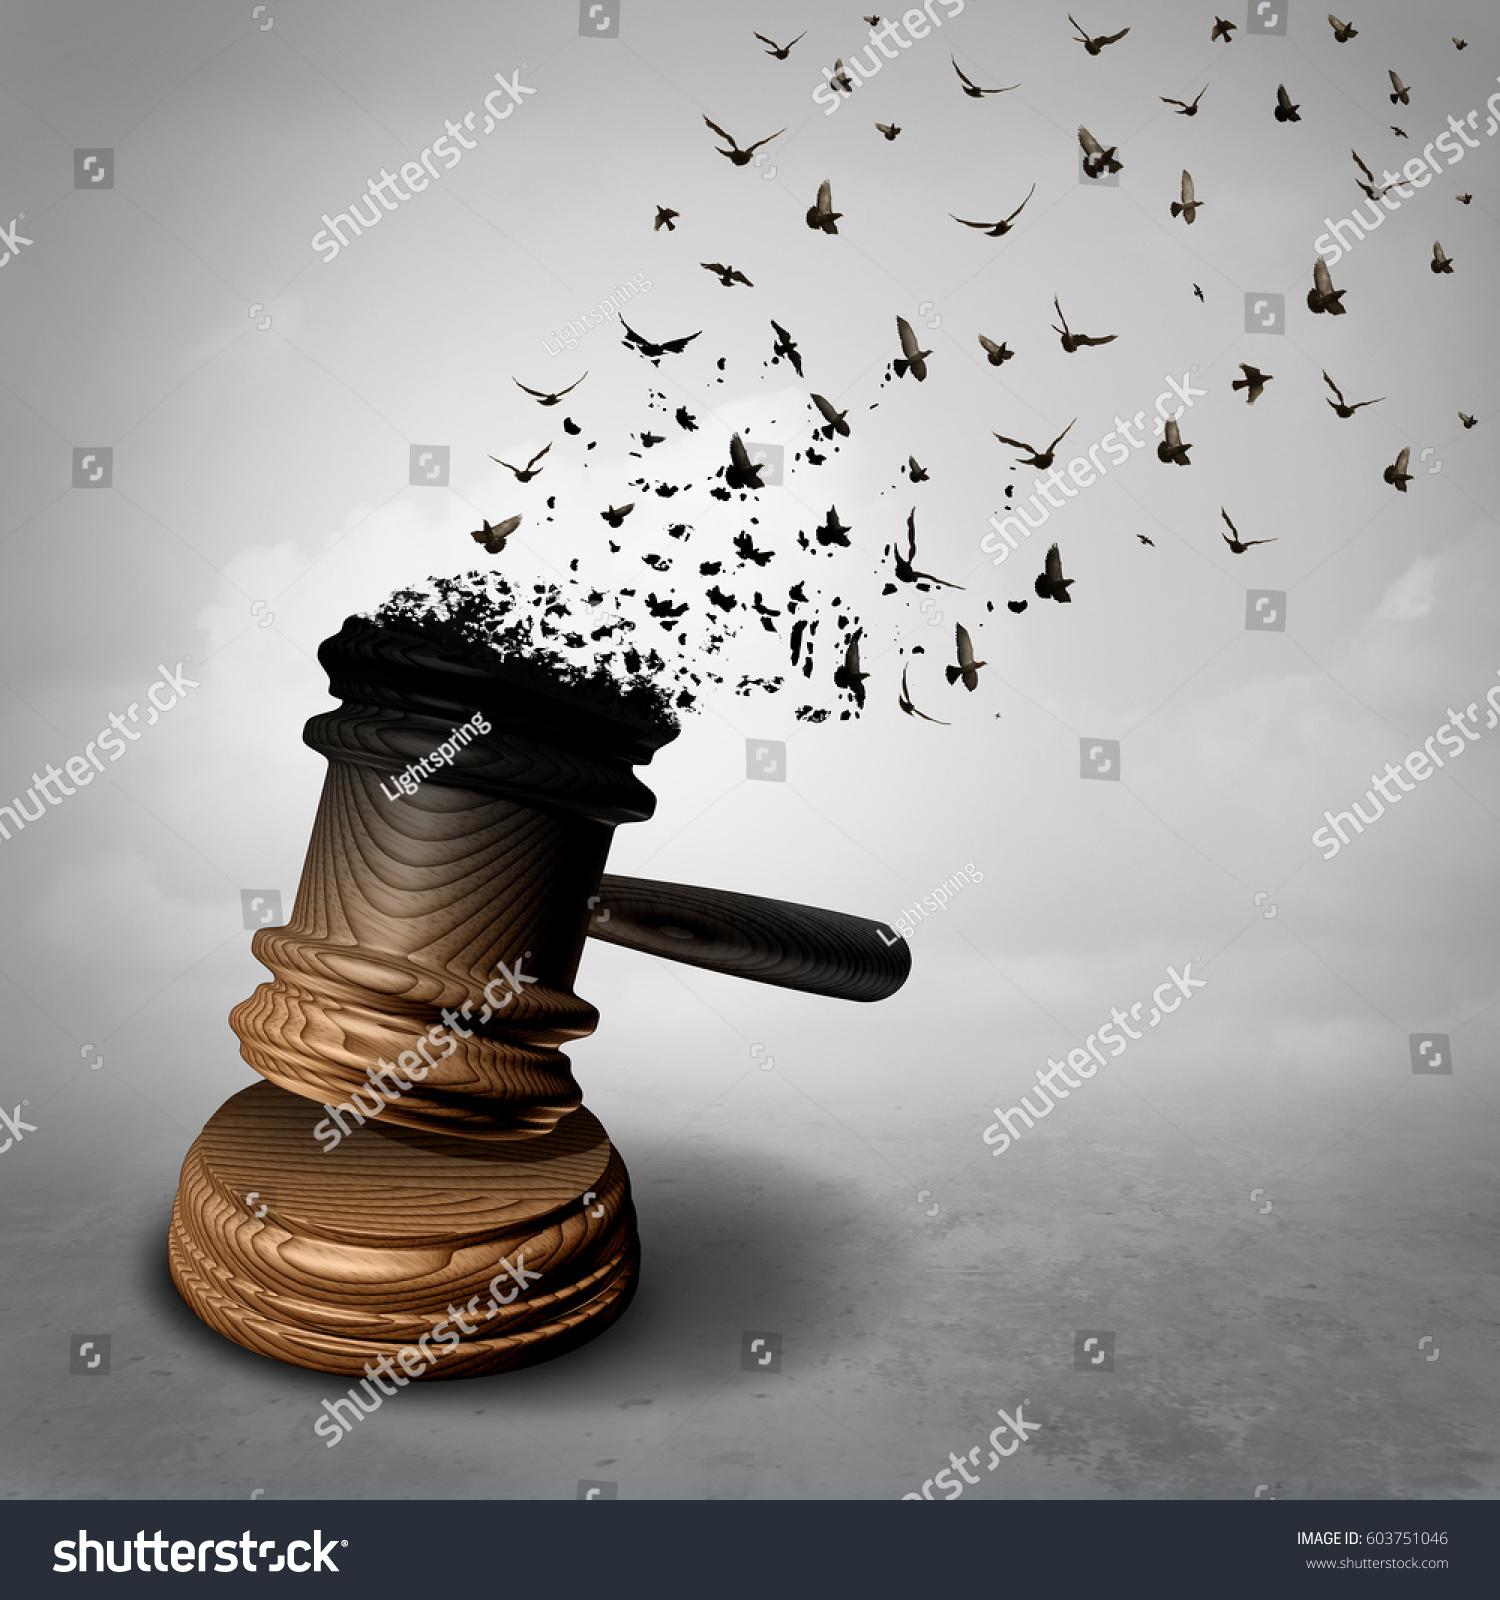 Amnesty Concept Law Decline Symbol Legal Stock Illustration